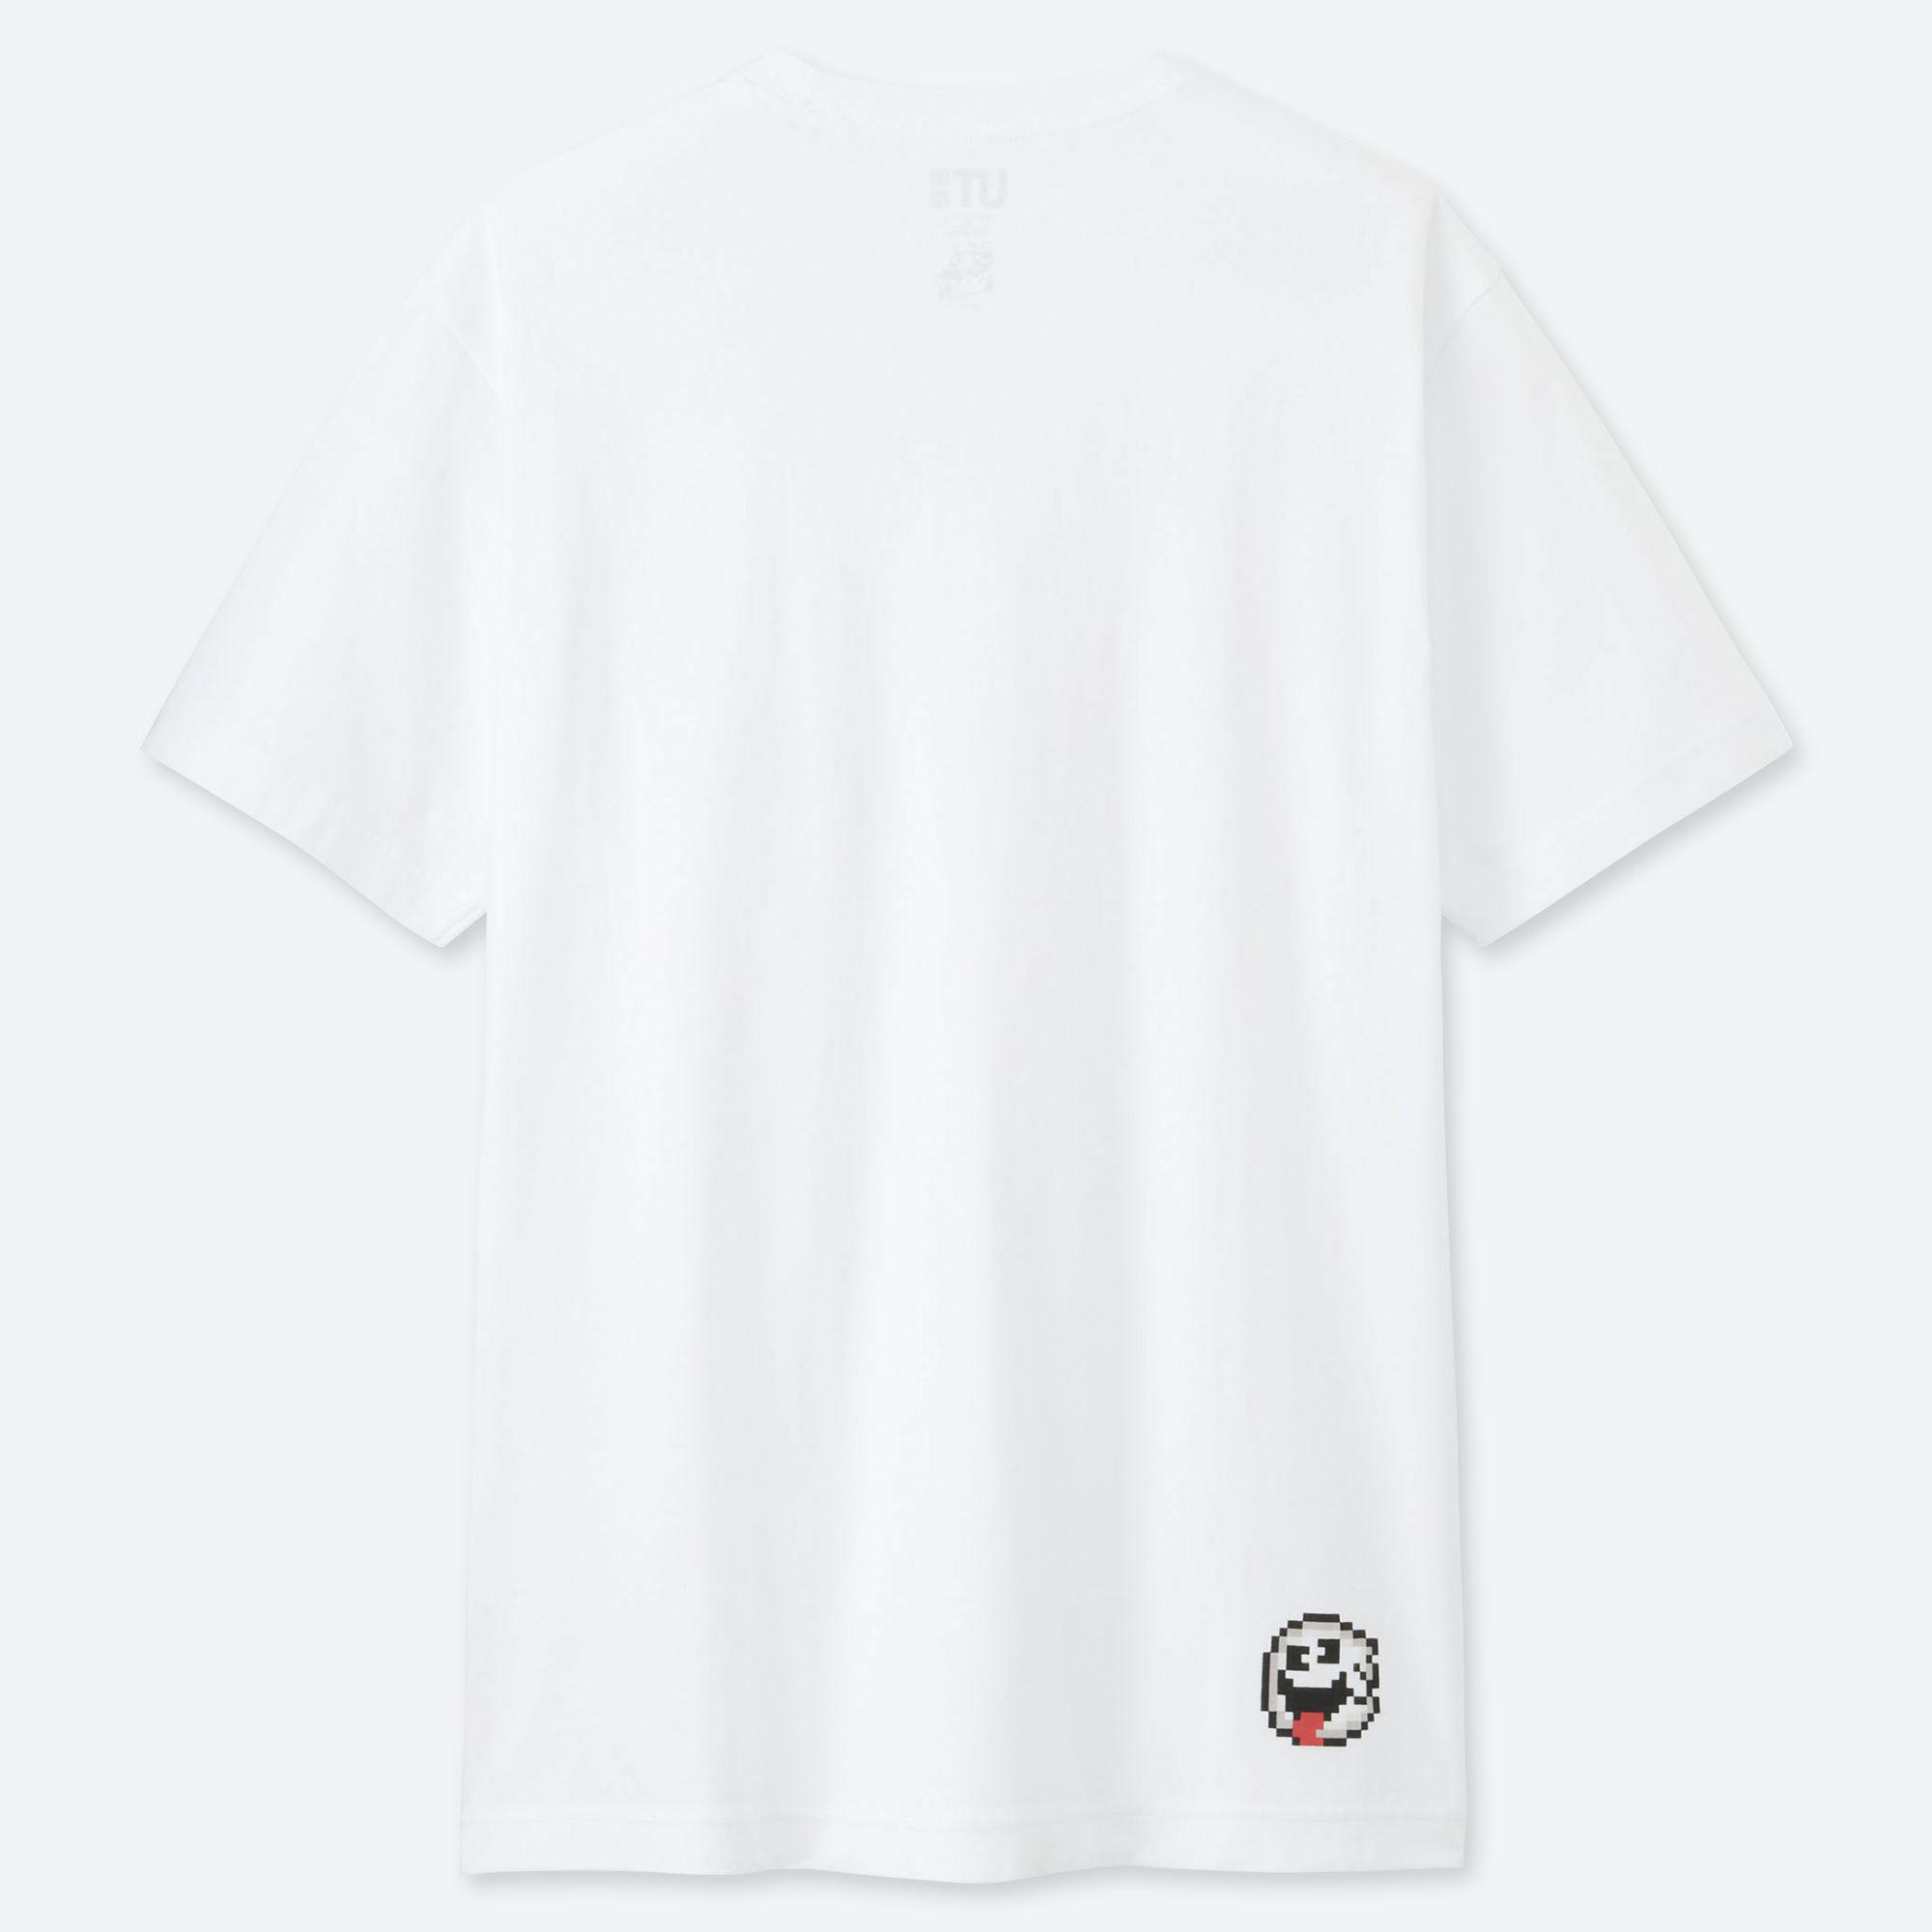 goods_419649_sub8?$pdp-medium$